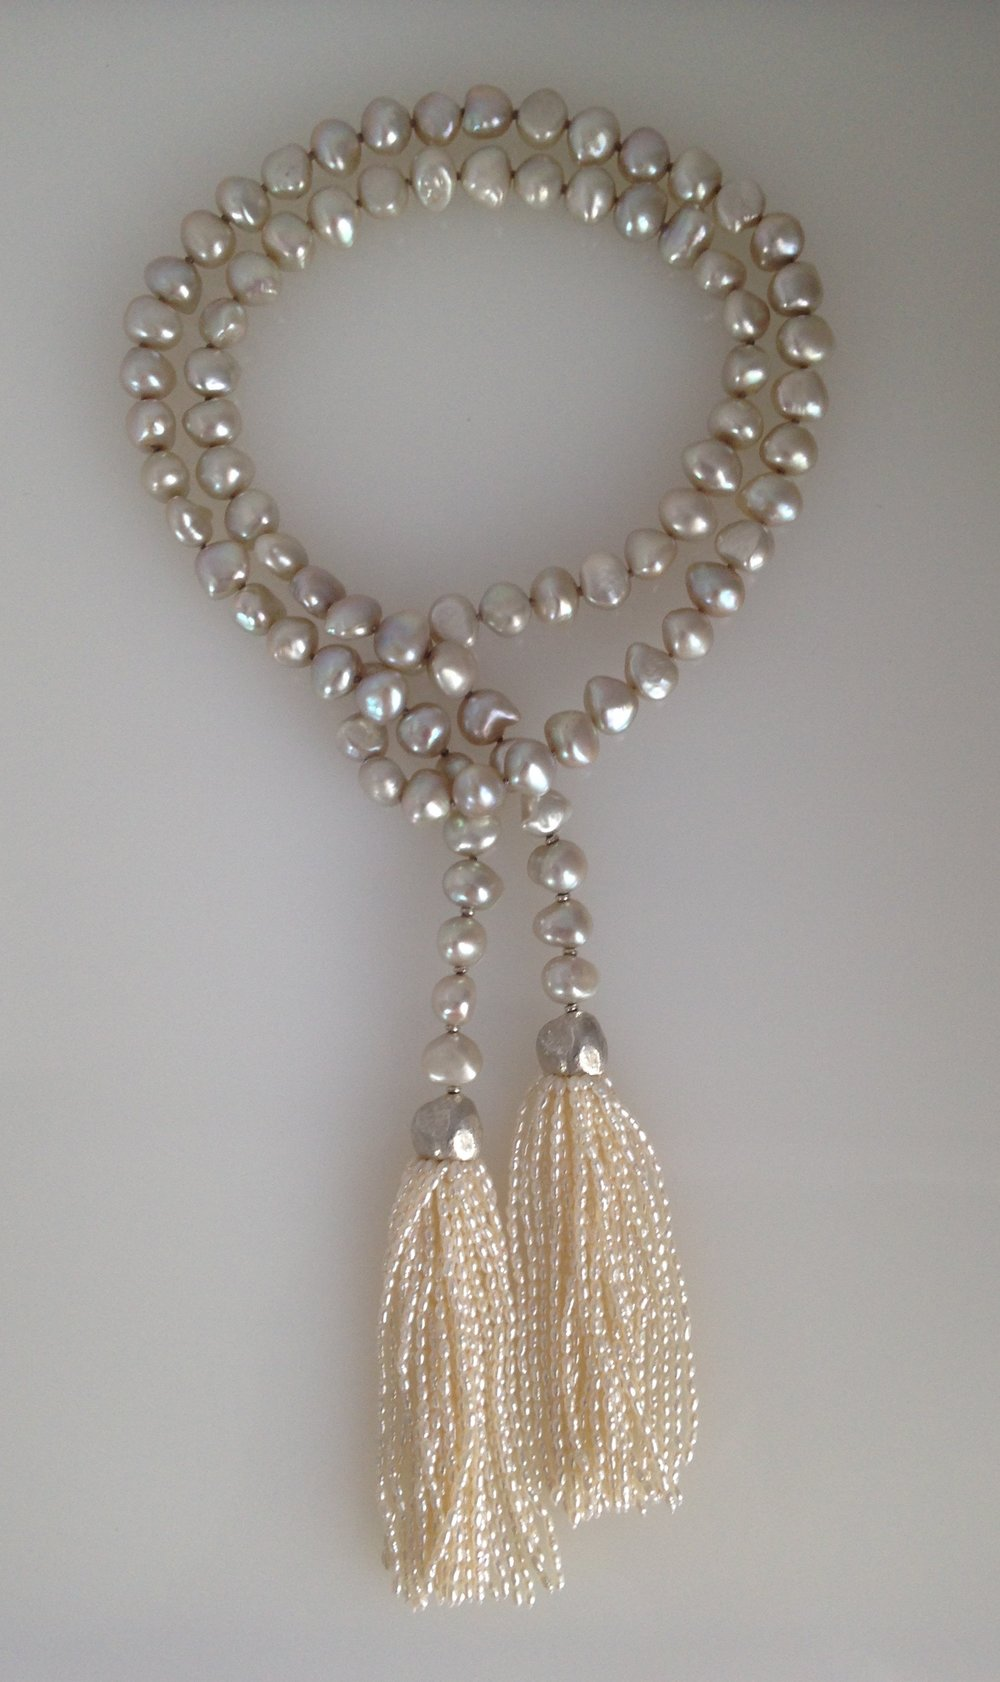 natural color grey pearls, silver